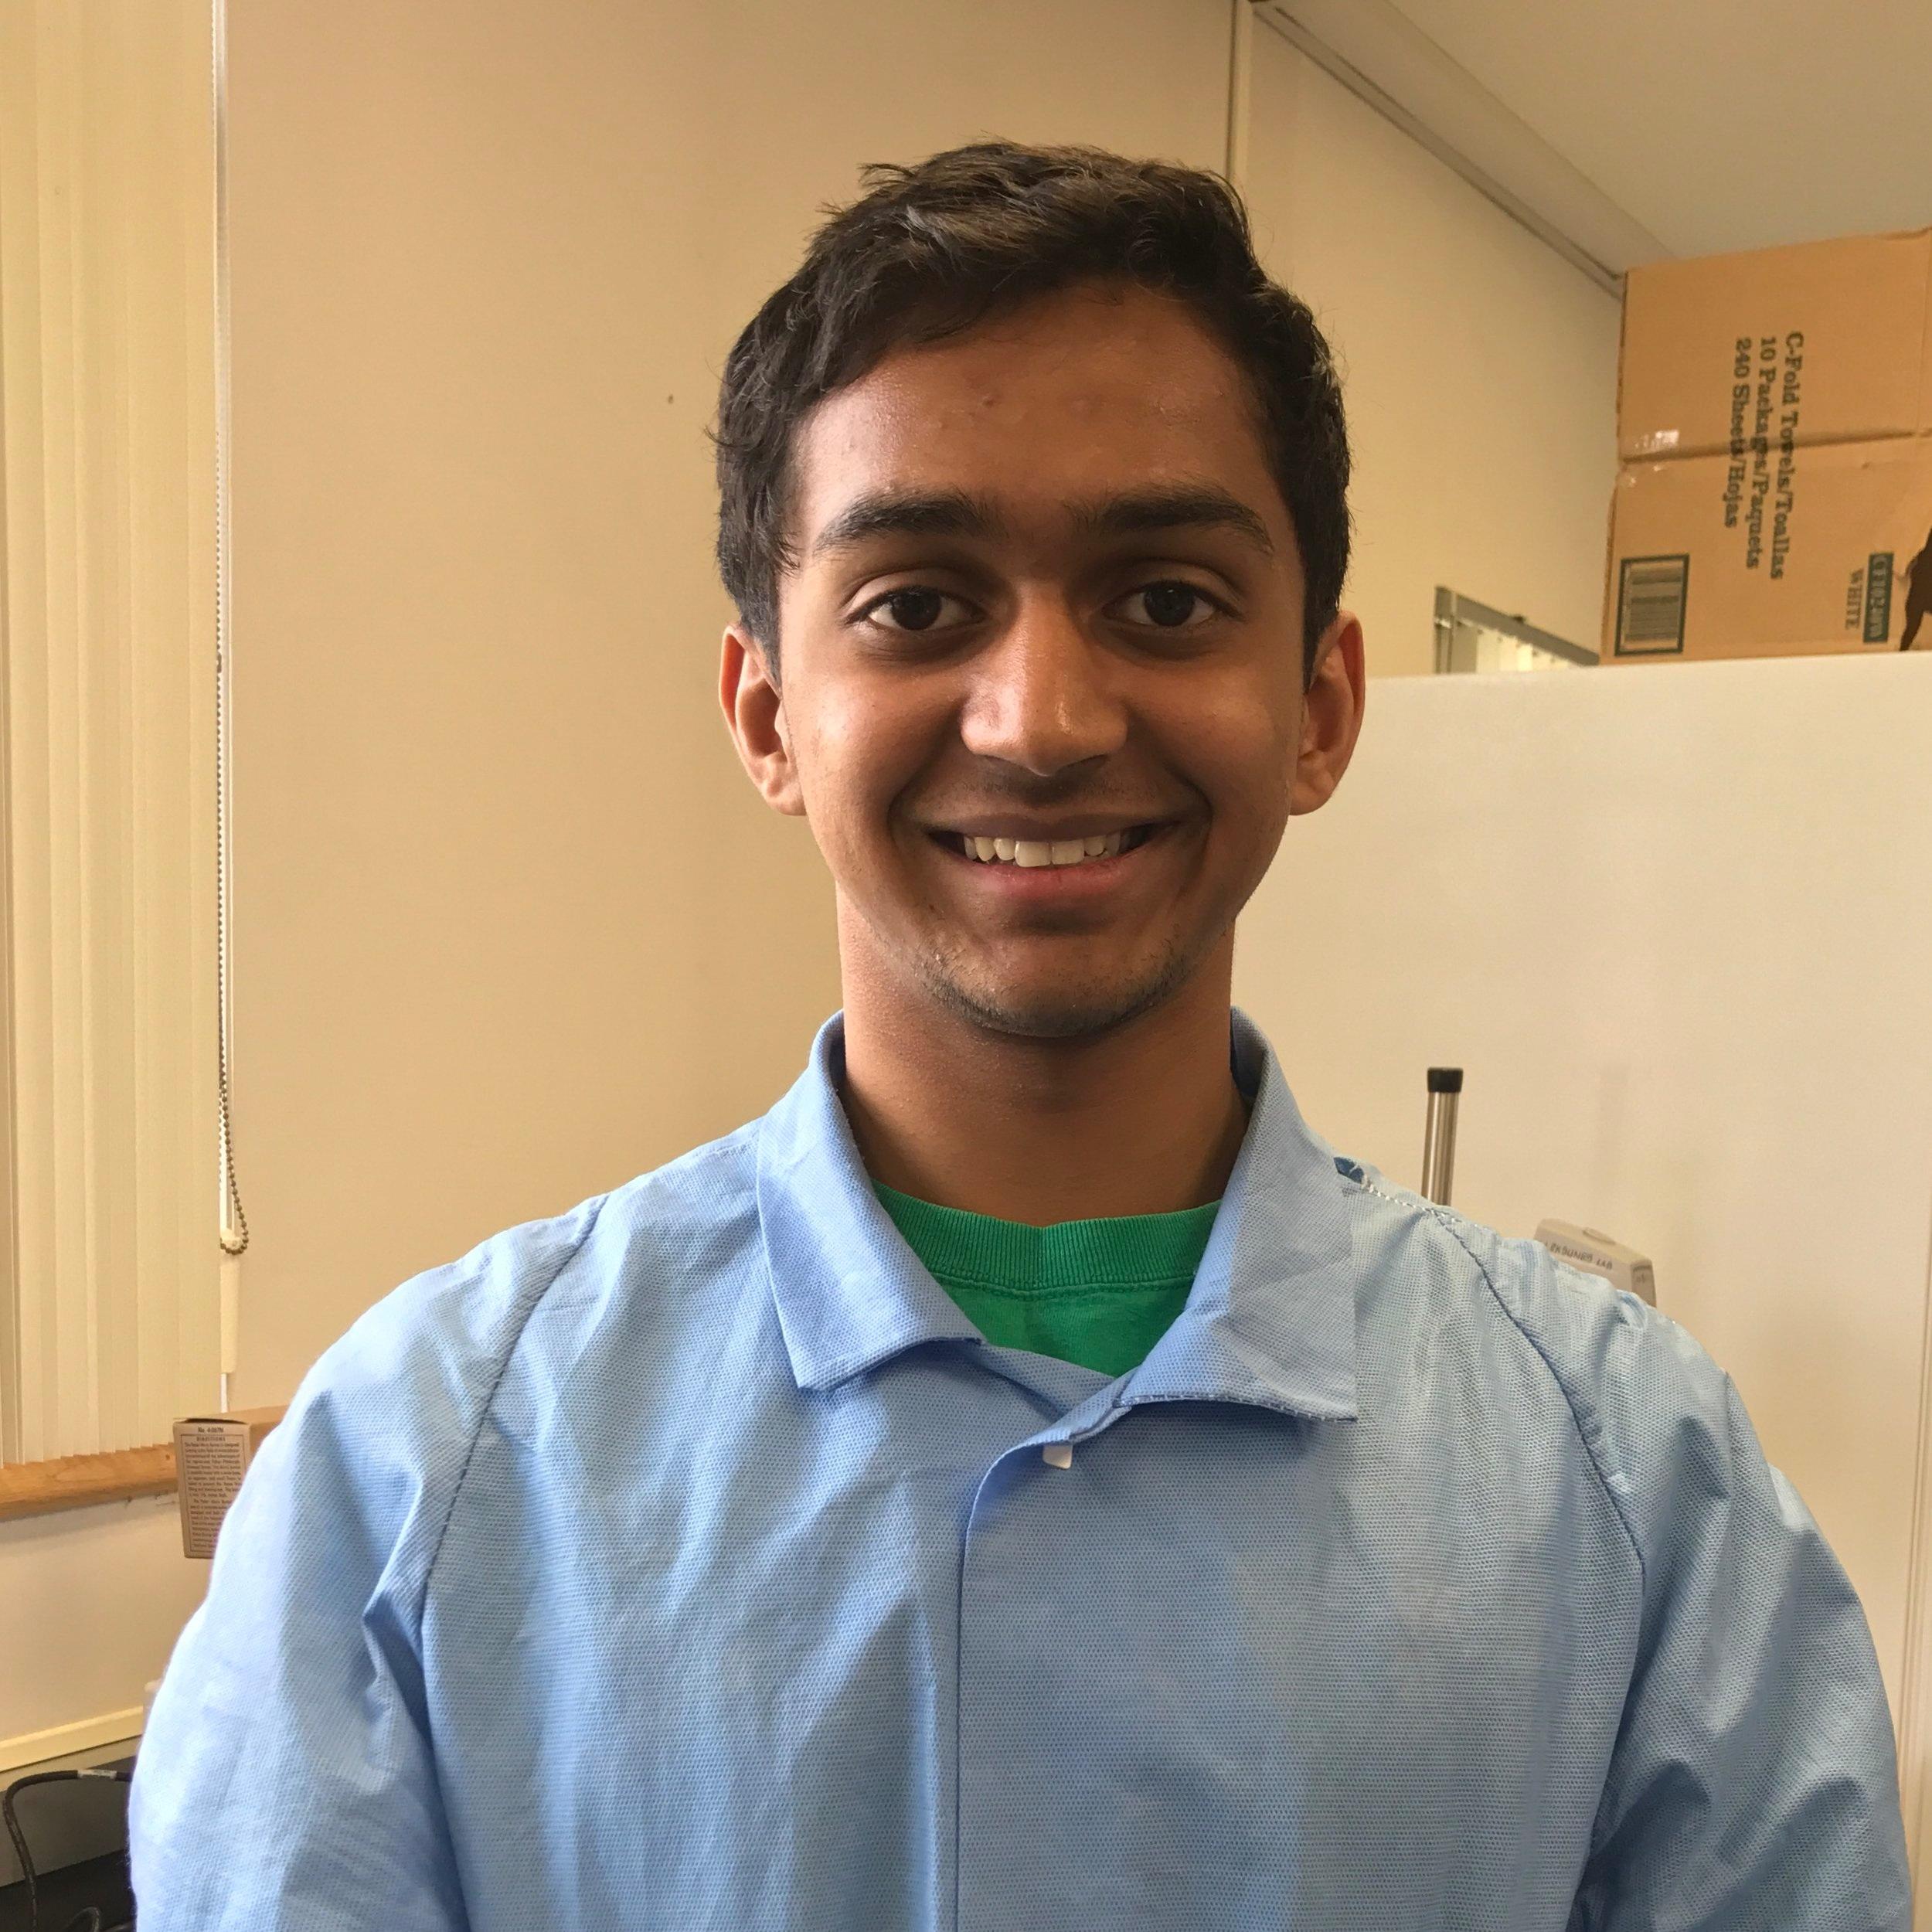 Vaibhav Mangipudy / Undergrad Student   Email: vsm2114@columbia.edu